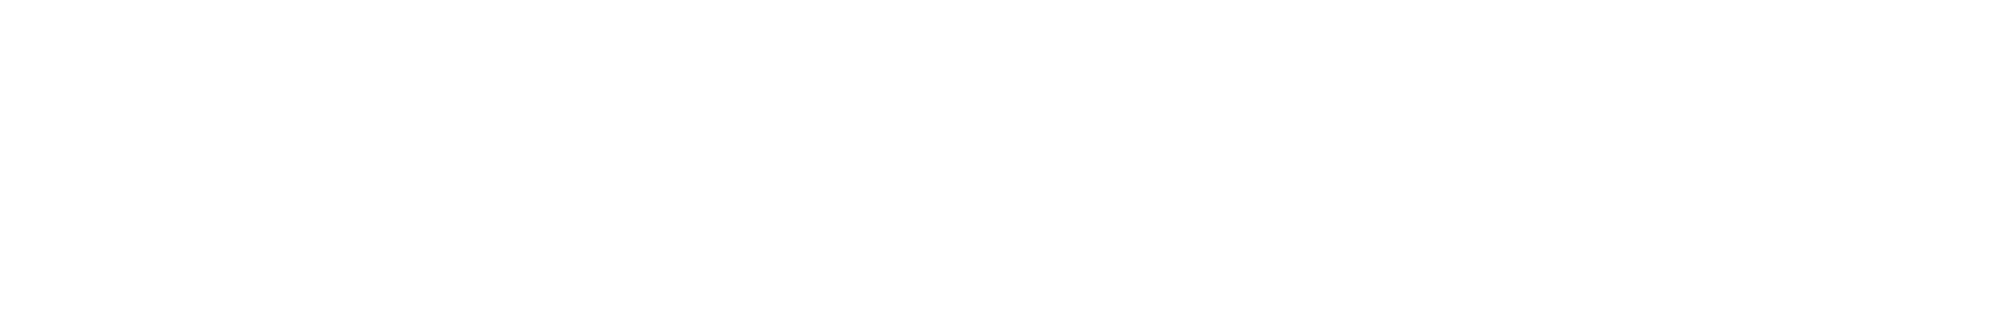 Ginestié Magellan Paley-Vincent - Attorneys